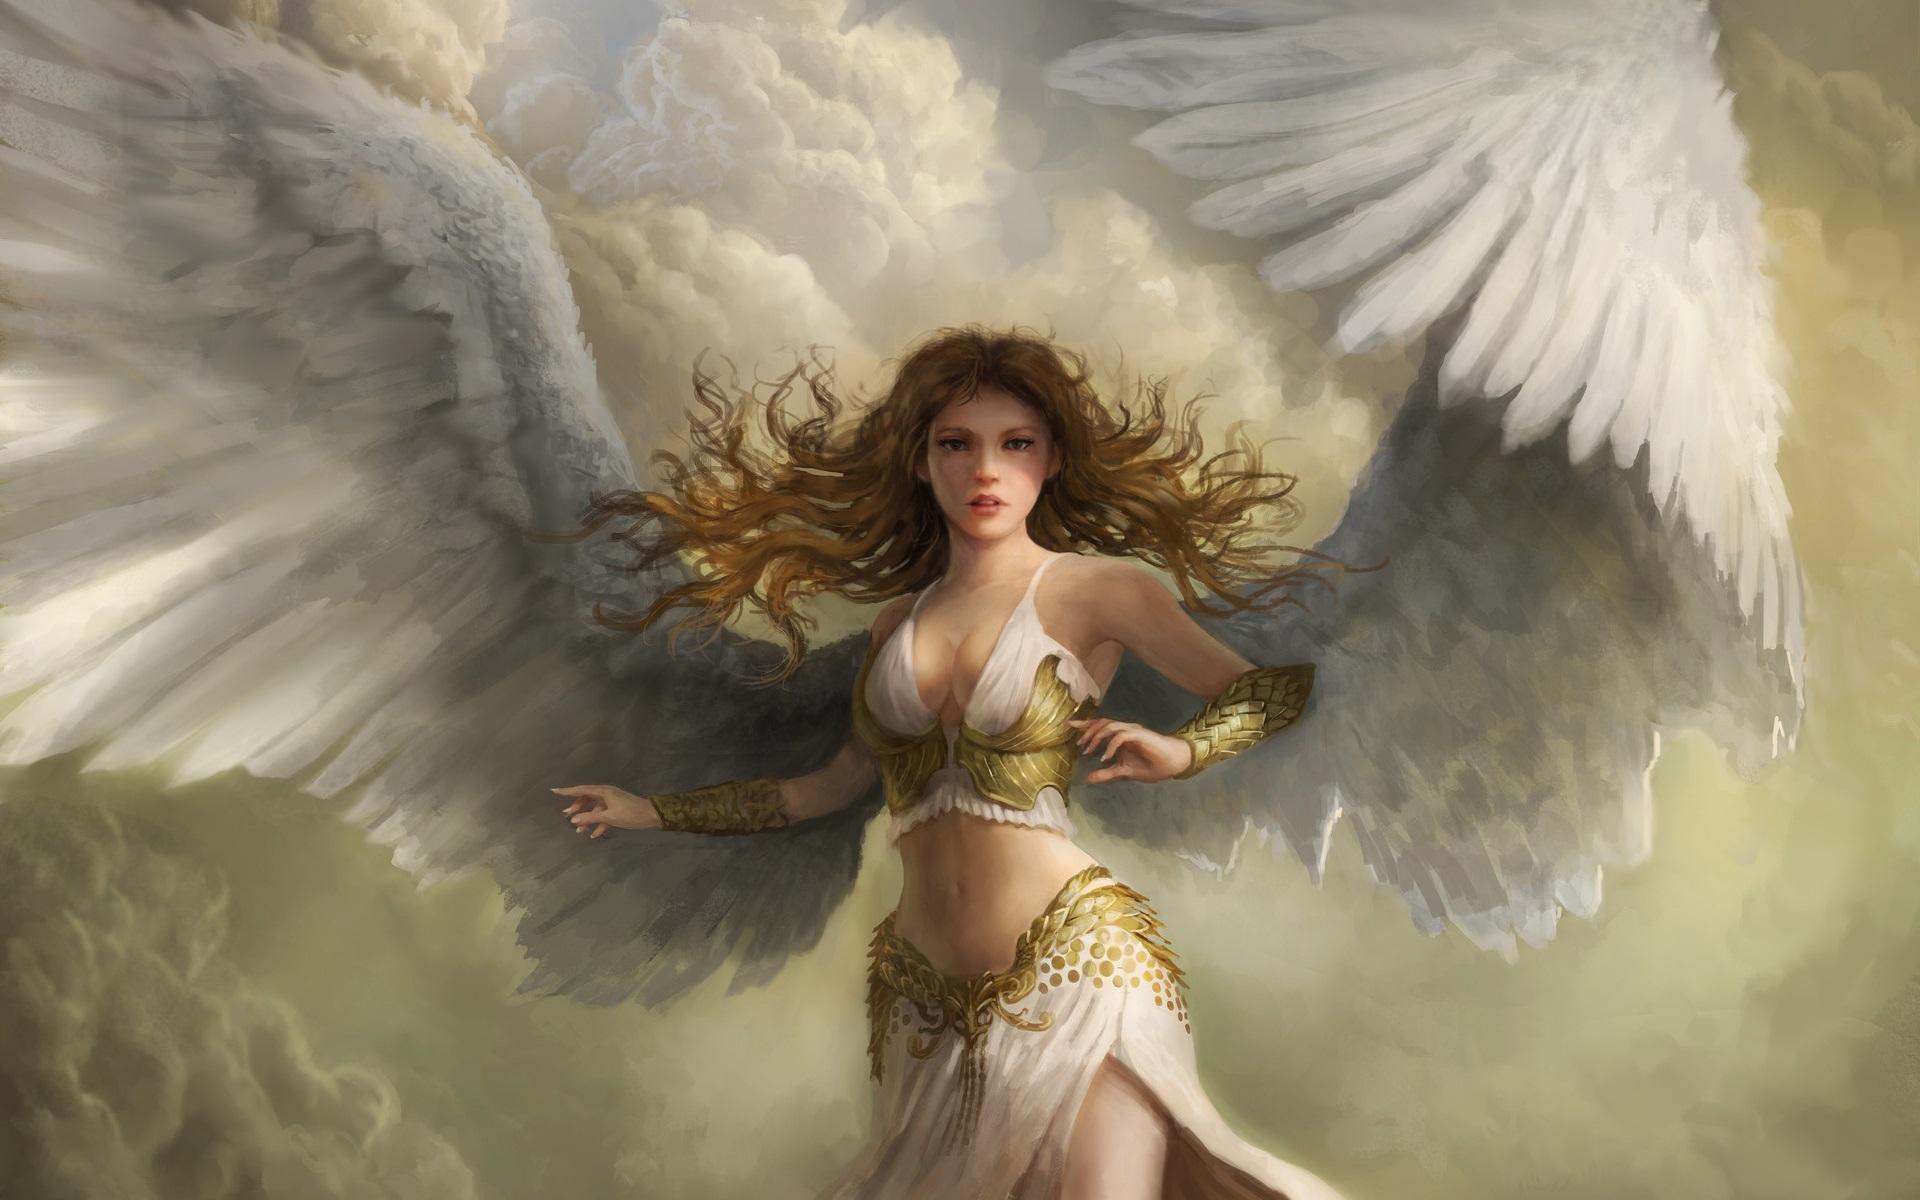 General 1920x1200 artwork fantasy art women fantasy girl angel wings redhead long hair